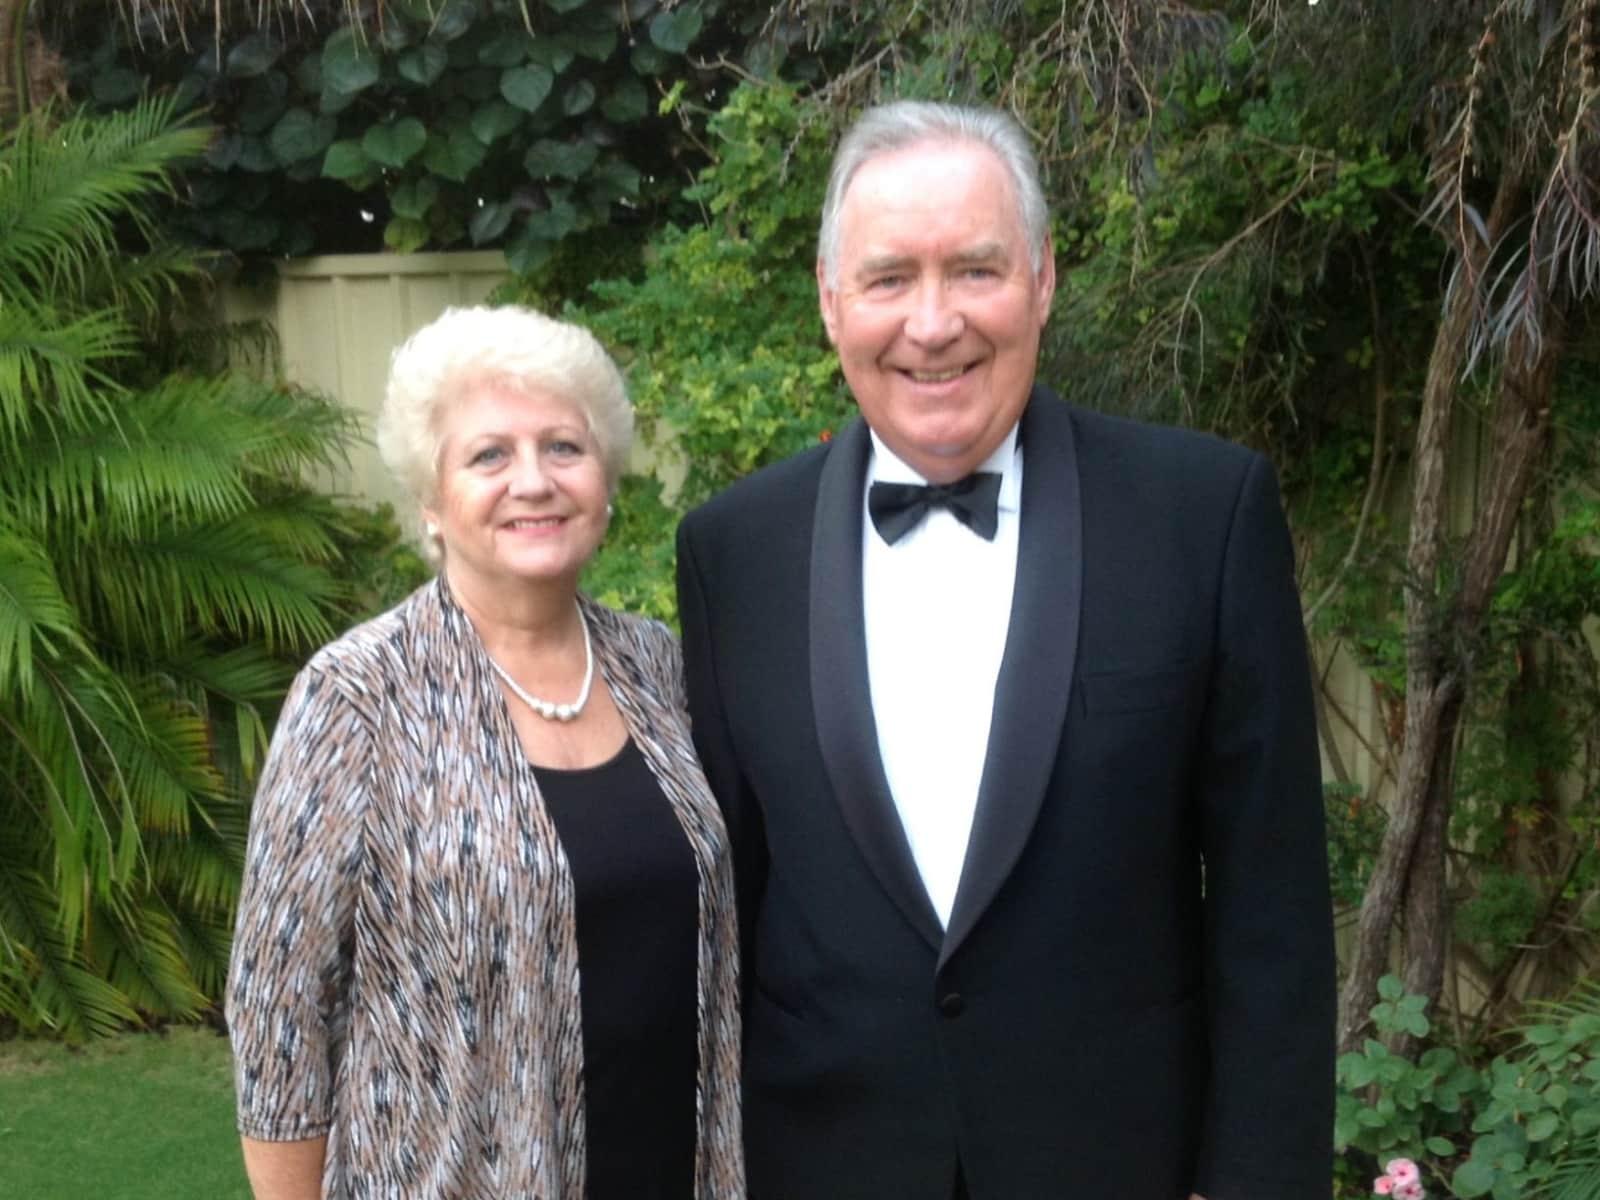 Brenda & Peter from Mandurah, Western Australia, Australia